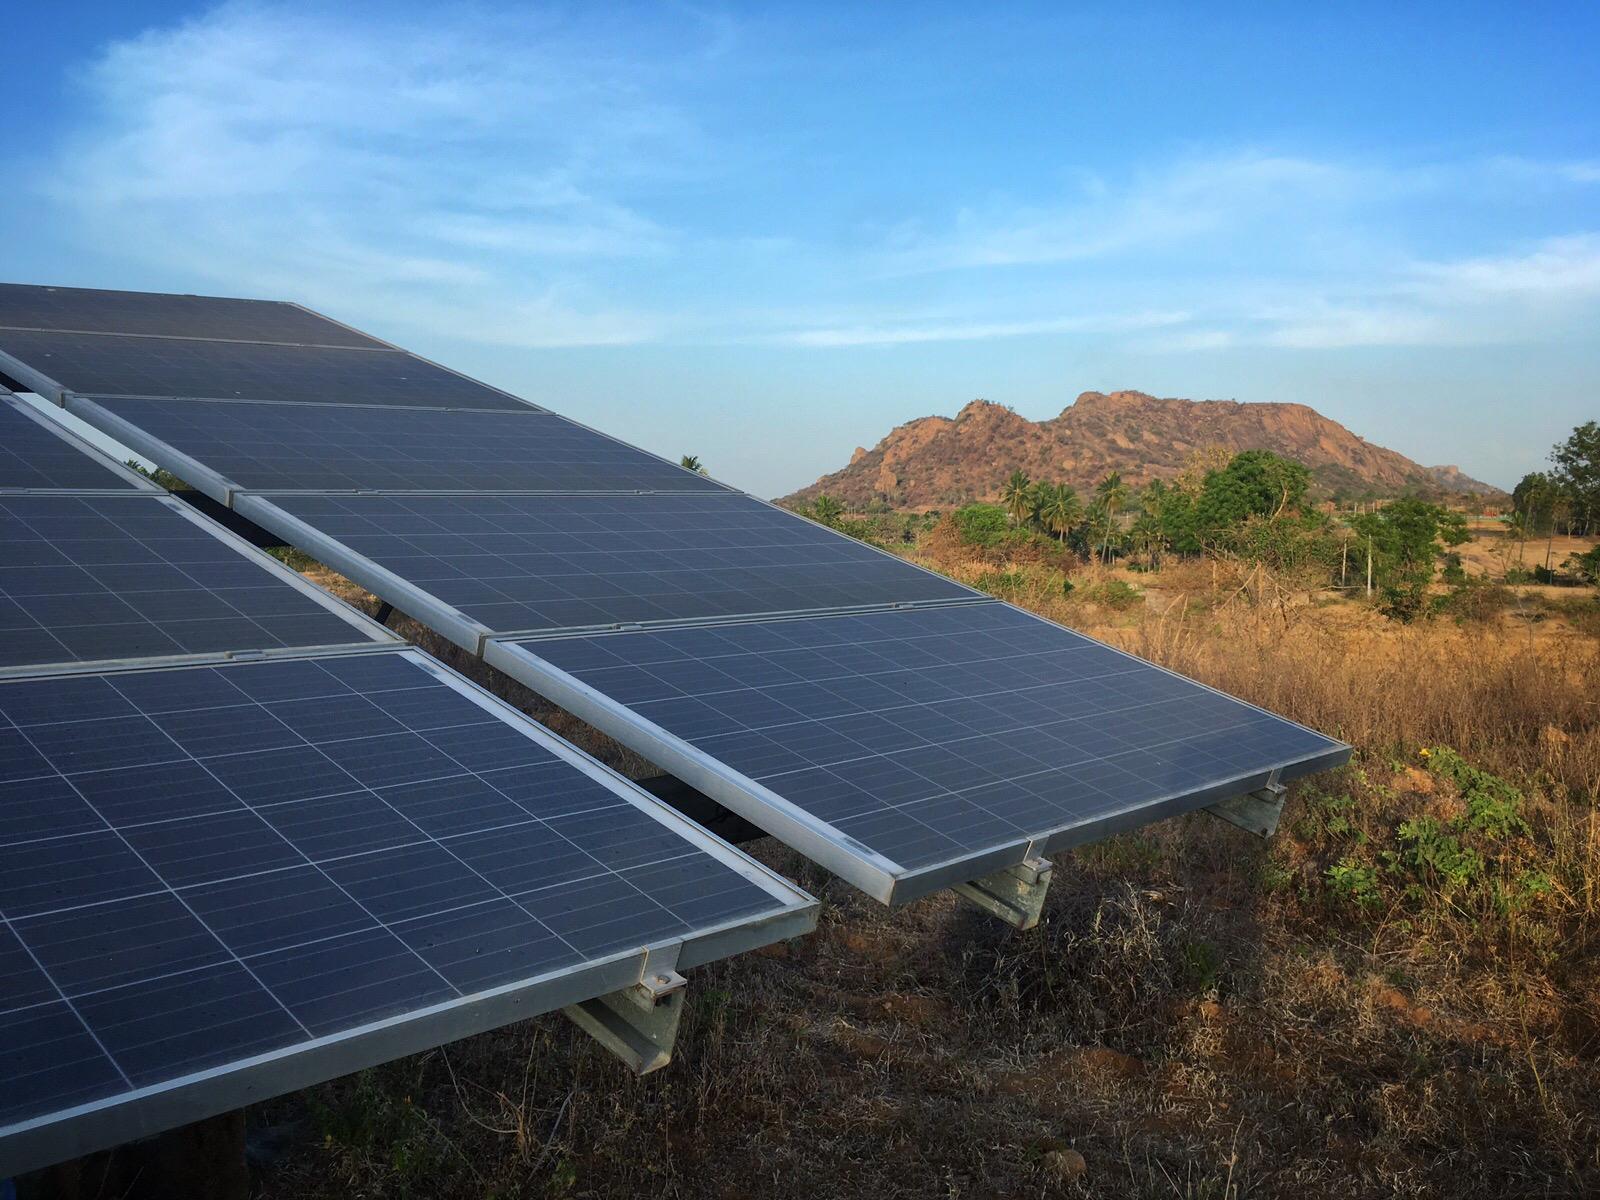 Solar panels on a farm in Karnataka.